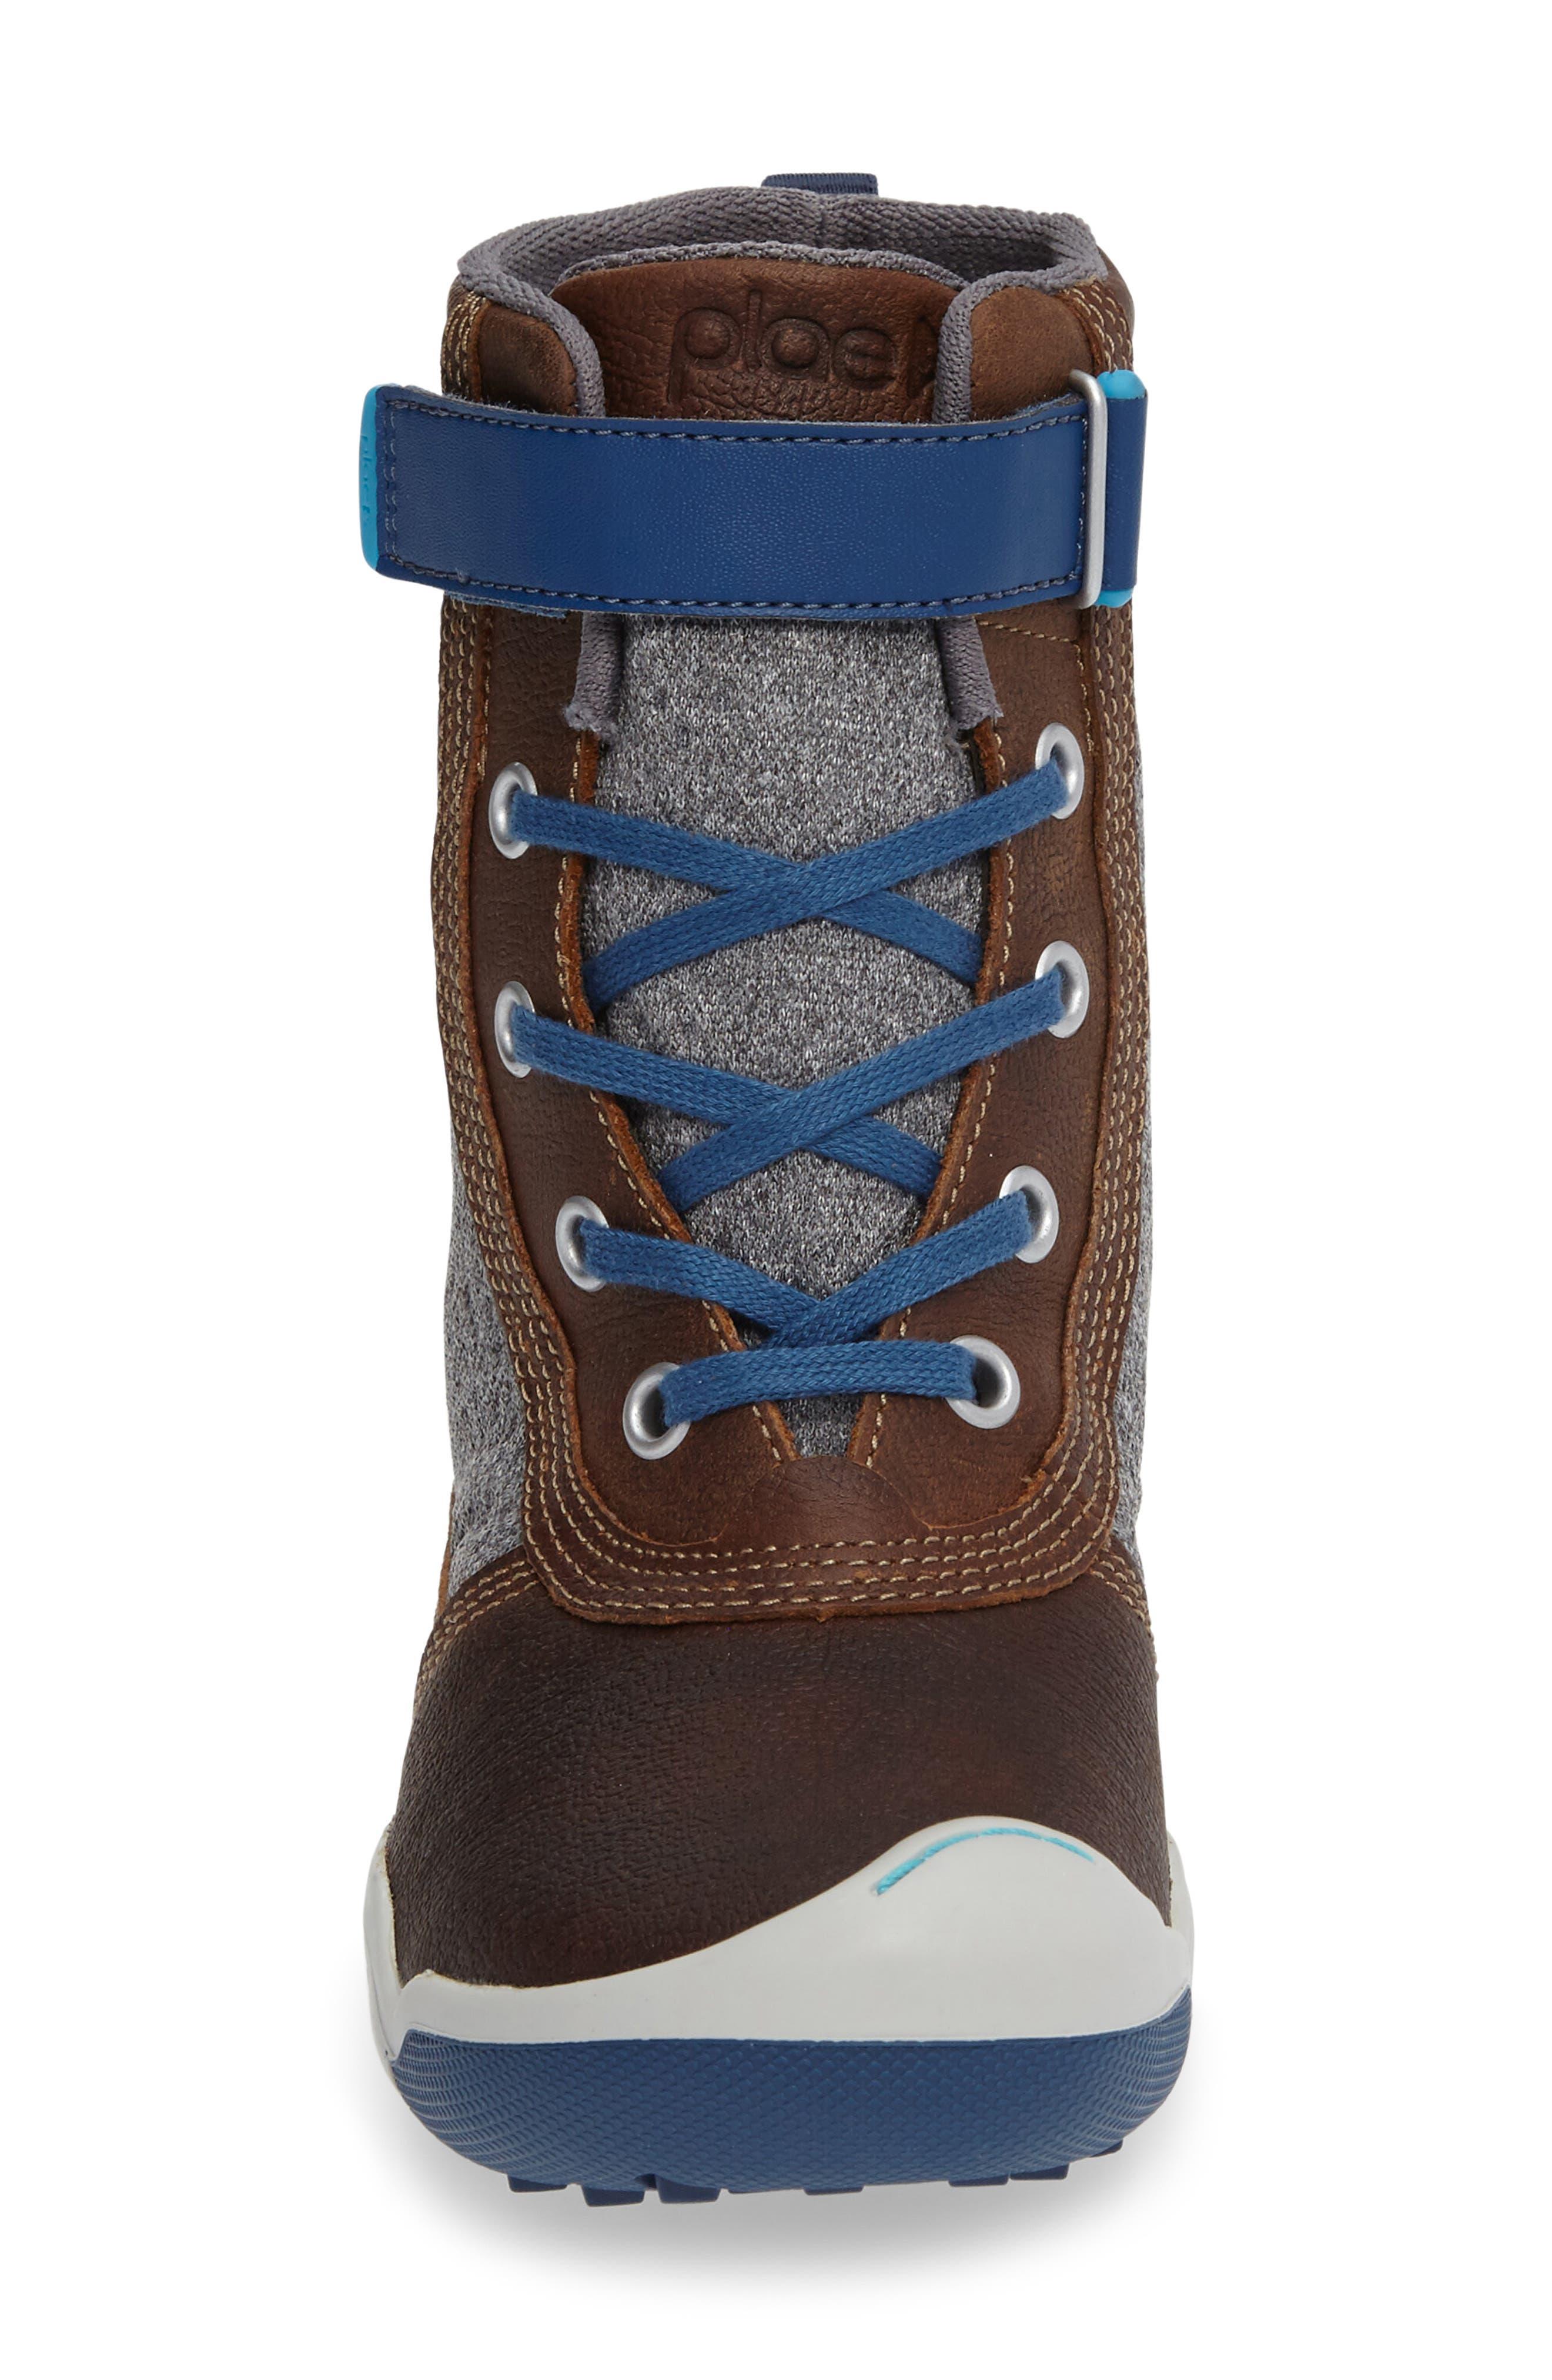 Noel Customizable Boot,                             Alternate thumbnail 3, color,                             214